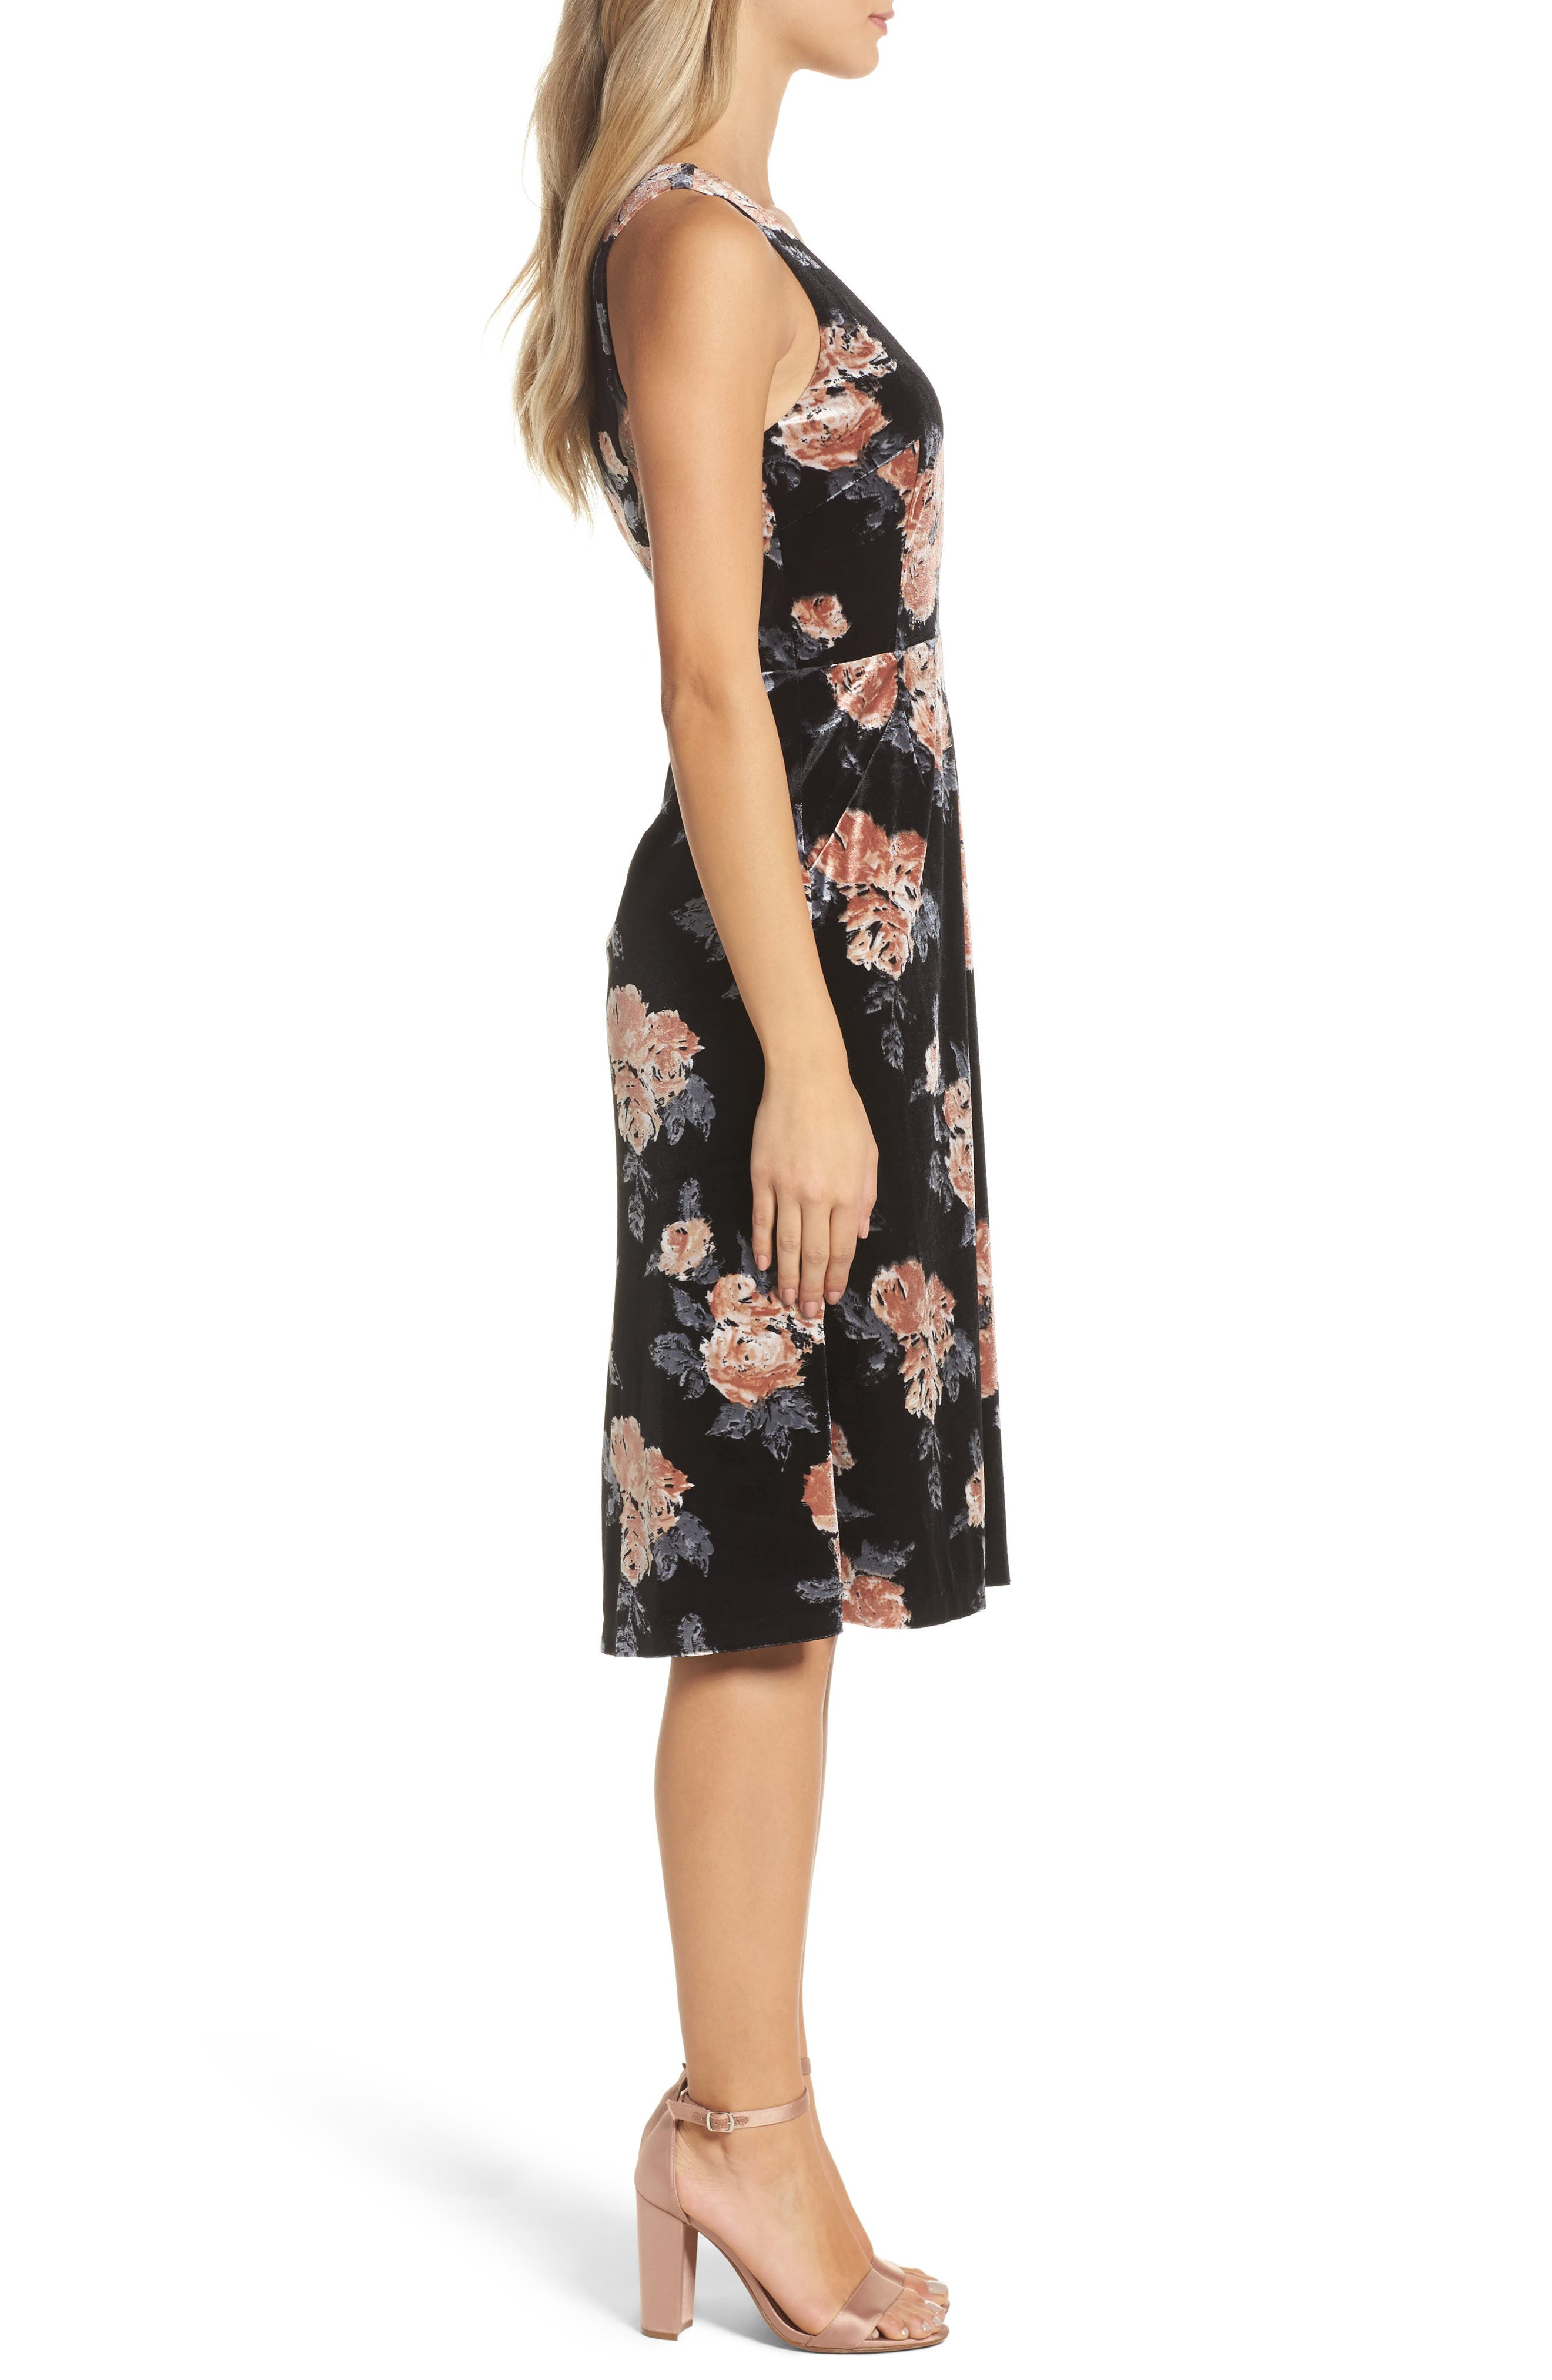 Costes Velvet Fit & Flare Dress,                             Alternate thumbnail 4, color,                             Black Rosettes